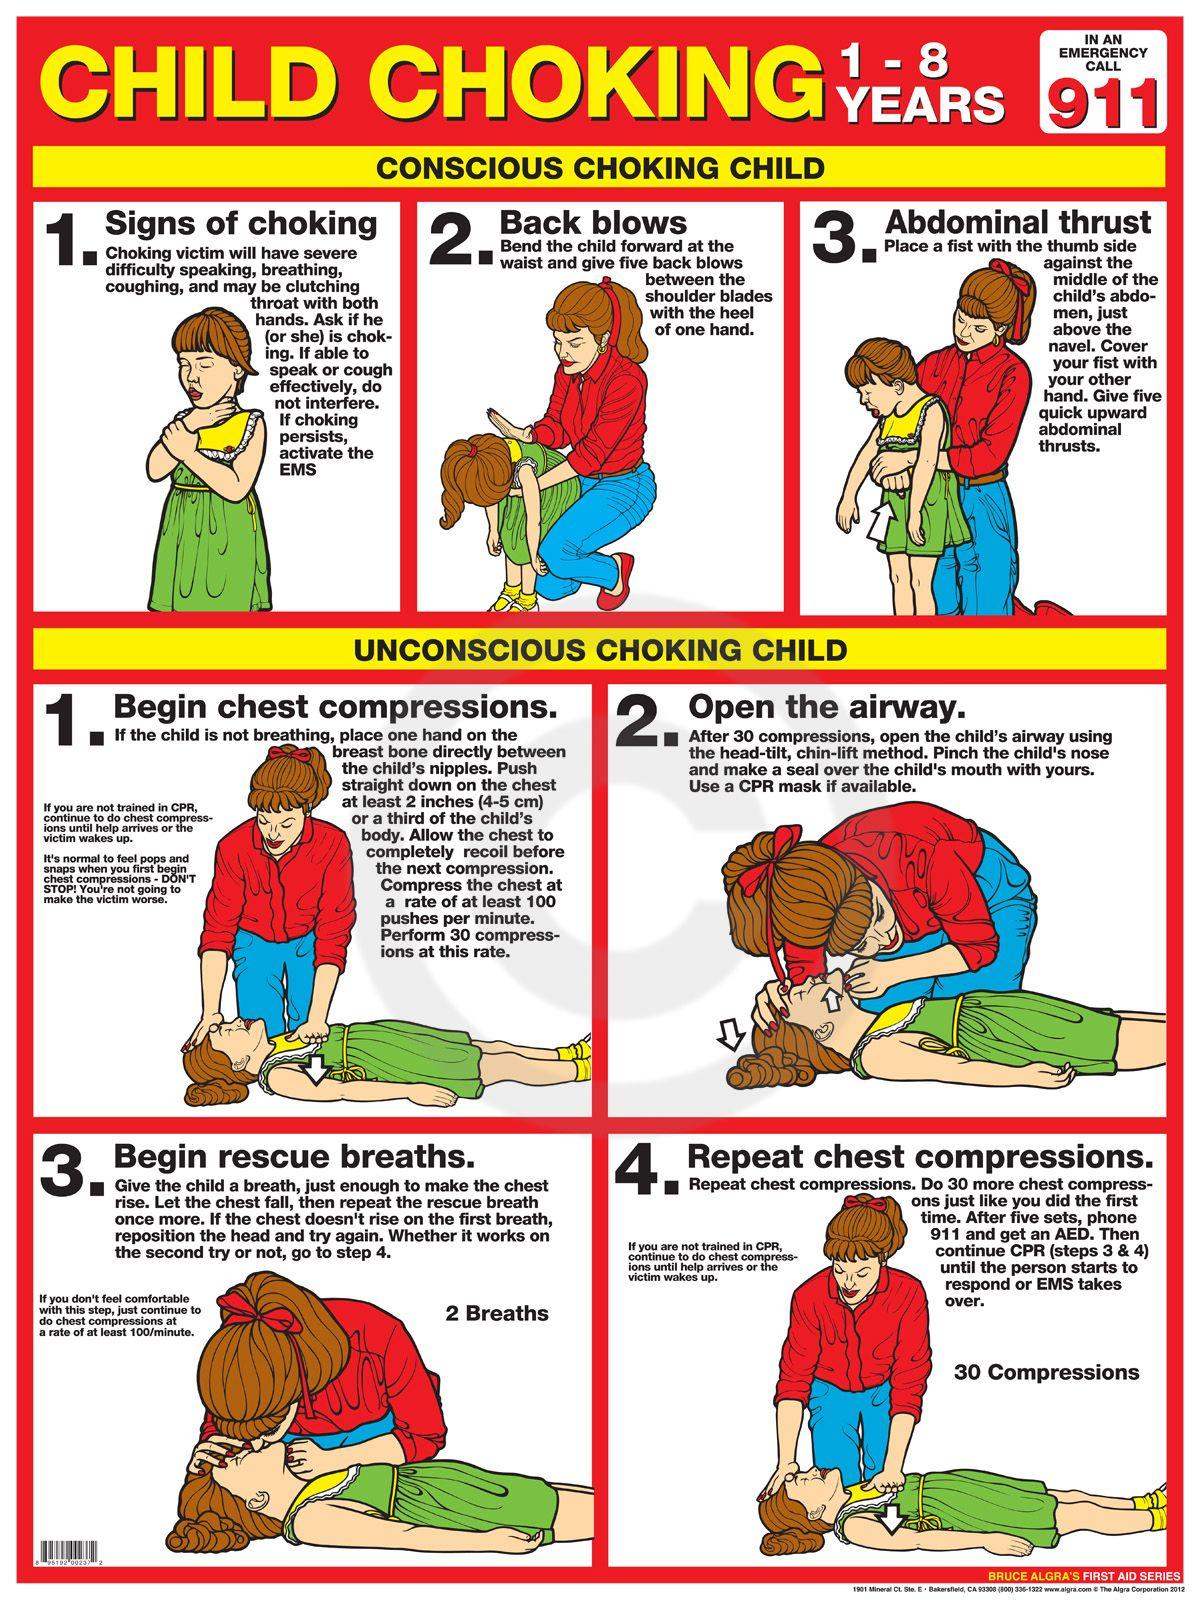 First+Aid+Choking+Child MY CAREER Pinterest